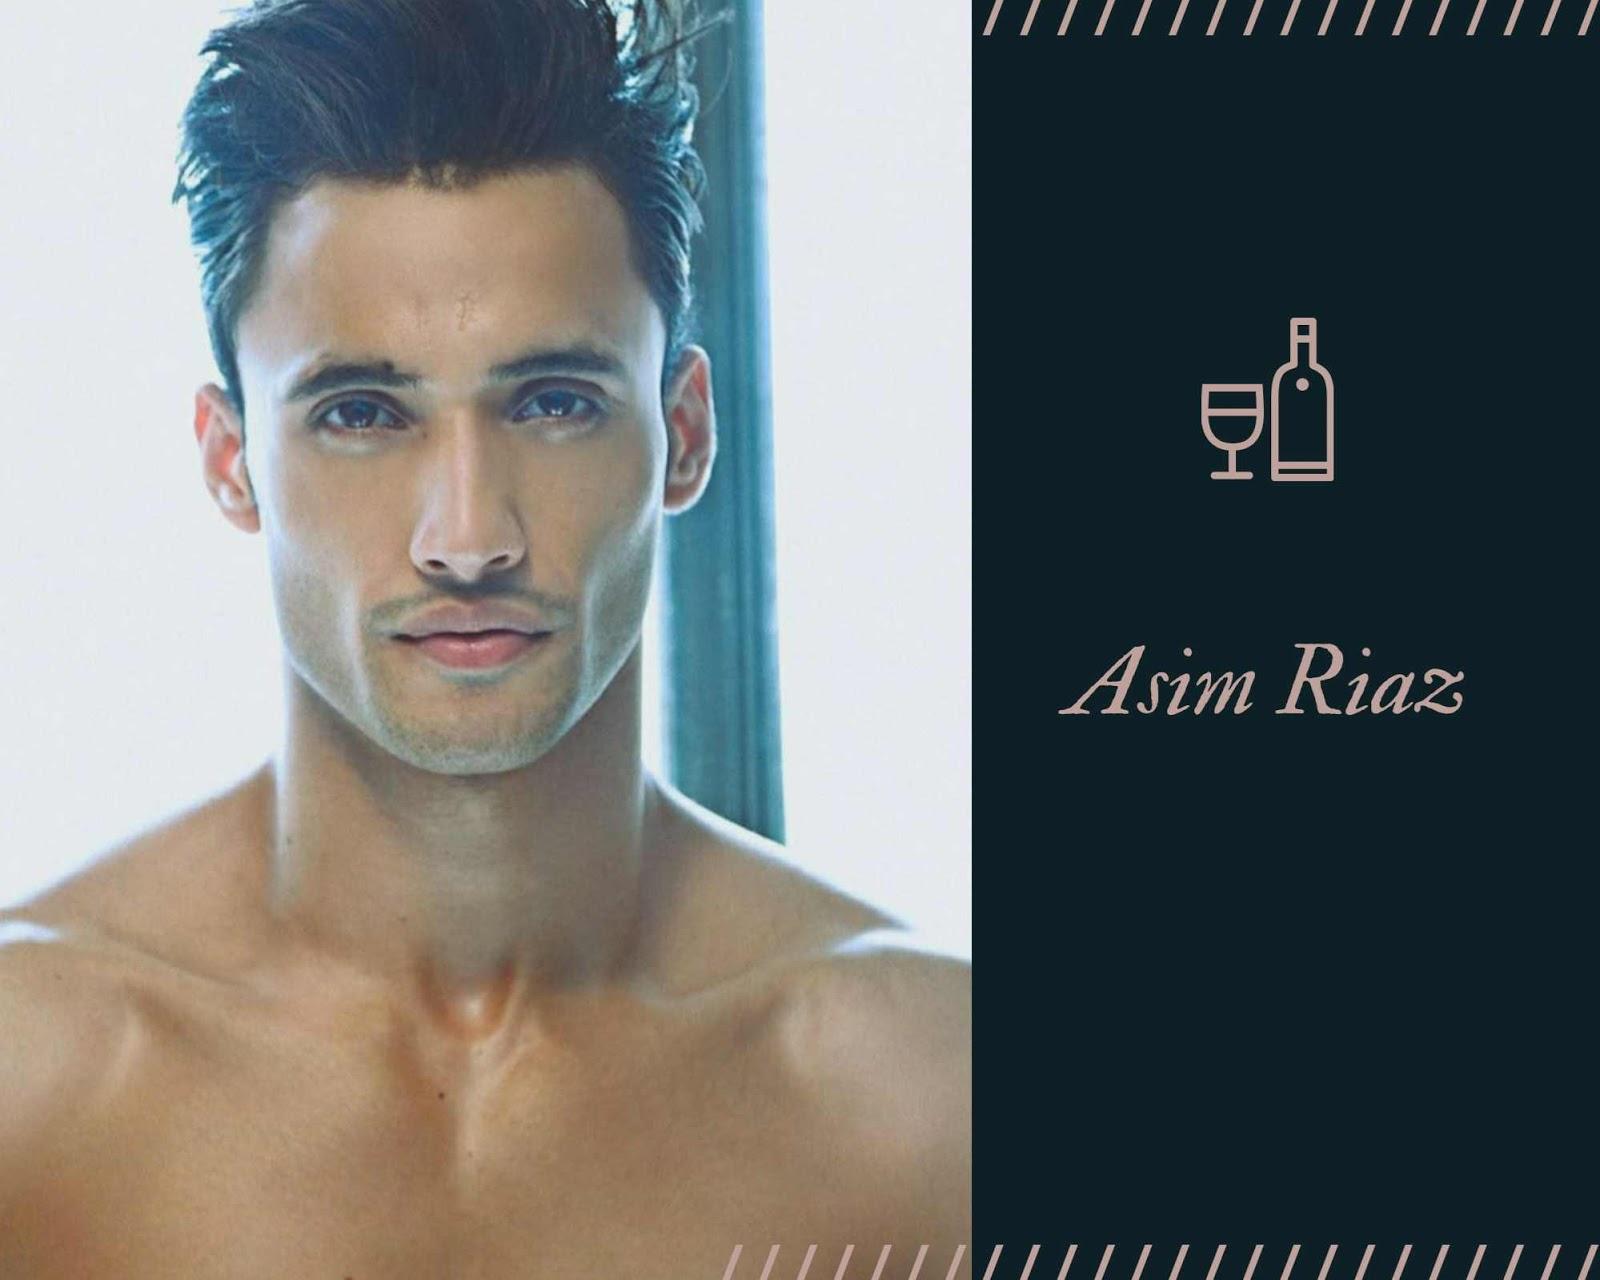 Asim Riaz Biography In Hindi